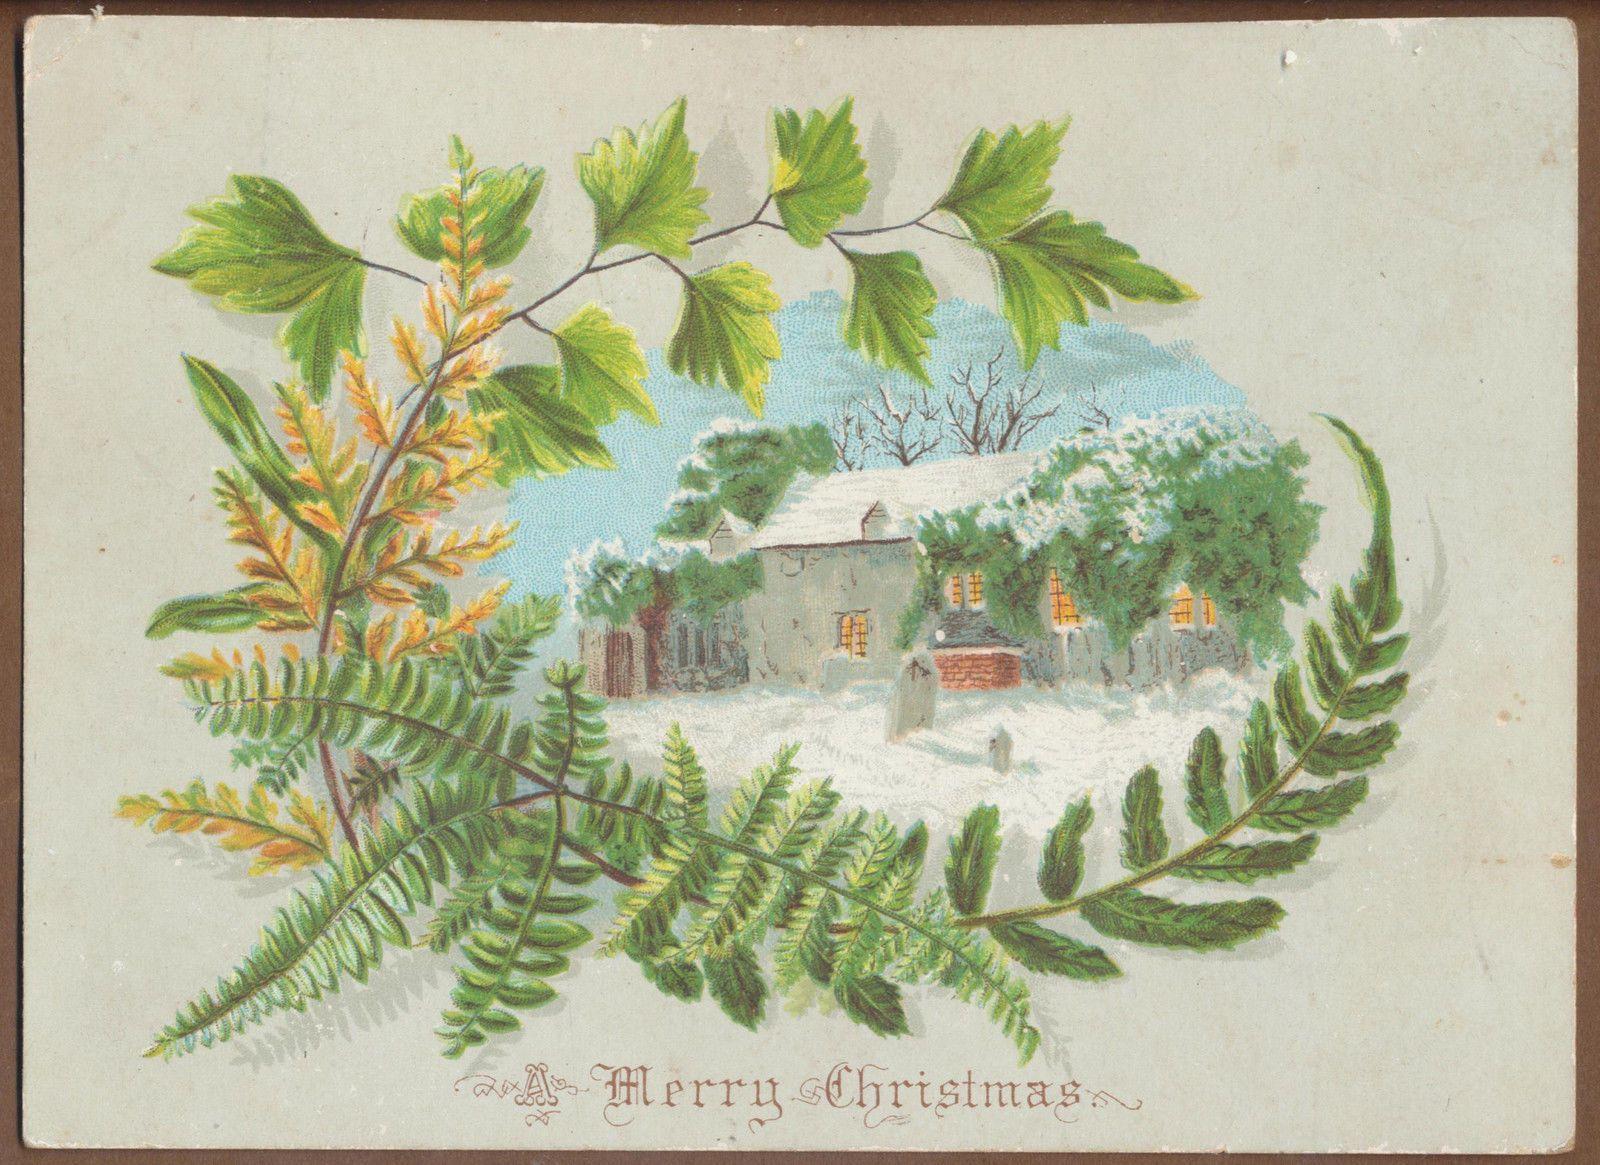 C9403 Victorian Xmas Card: Scene & Ferns | eBay